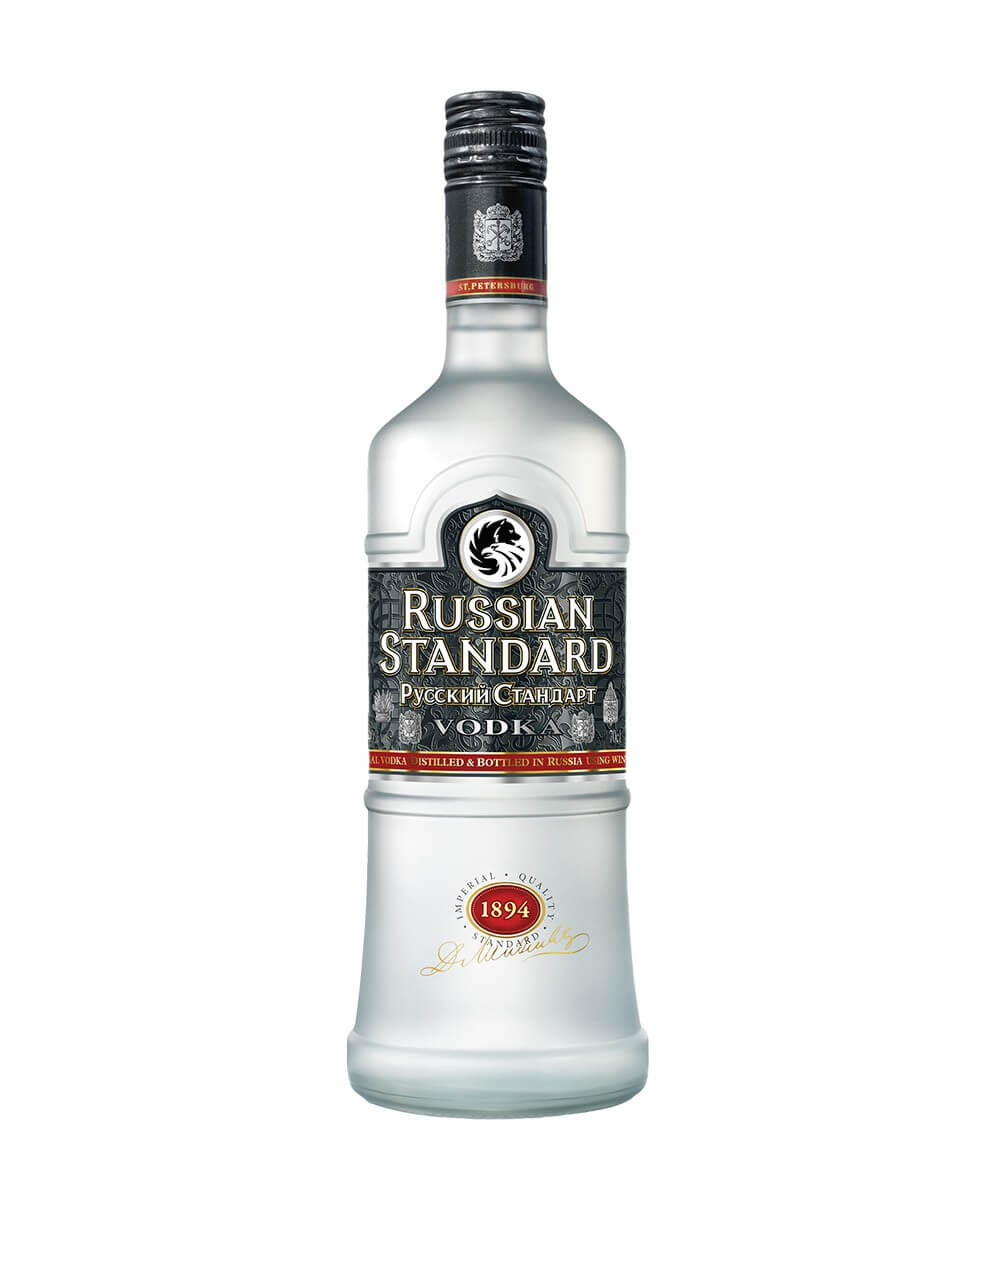 Russian standard vodka actually is a standard